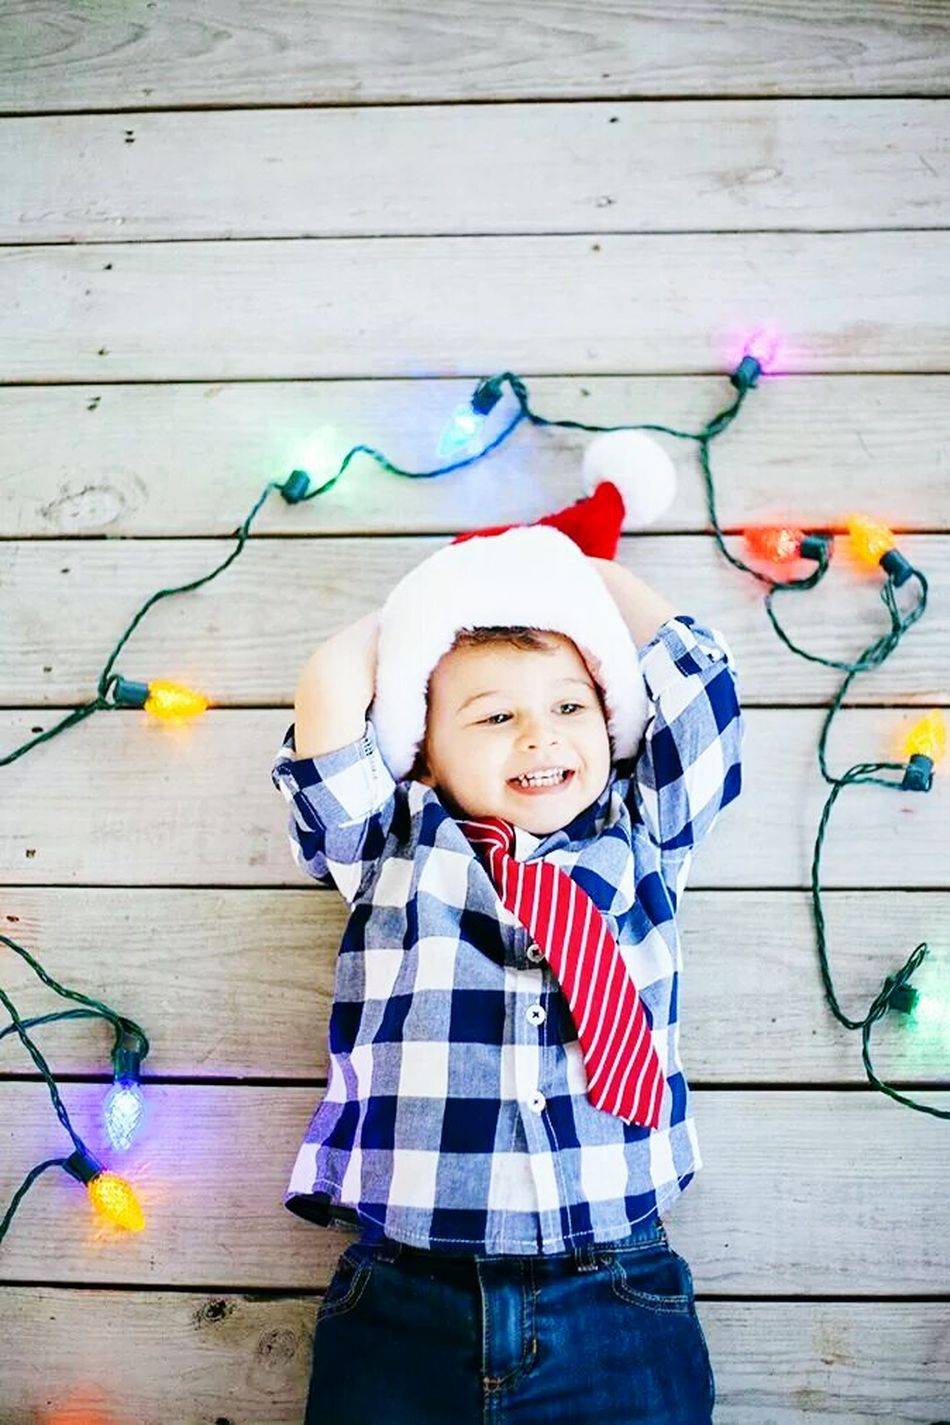 iam a muslim and i say,holiday happy birthday to everyone christian. Marychristmas Chrstmas:)) Muslim Merychristmas